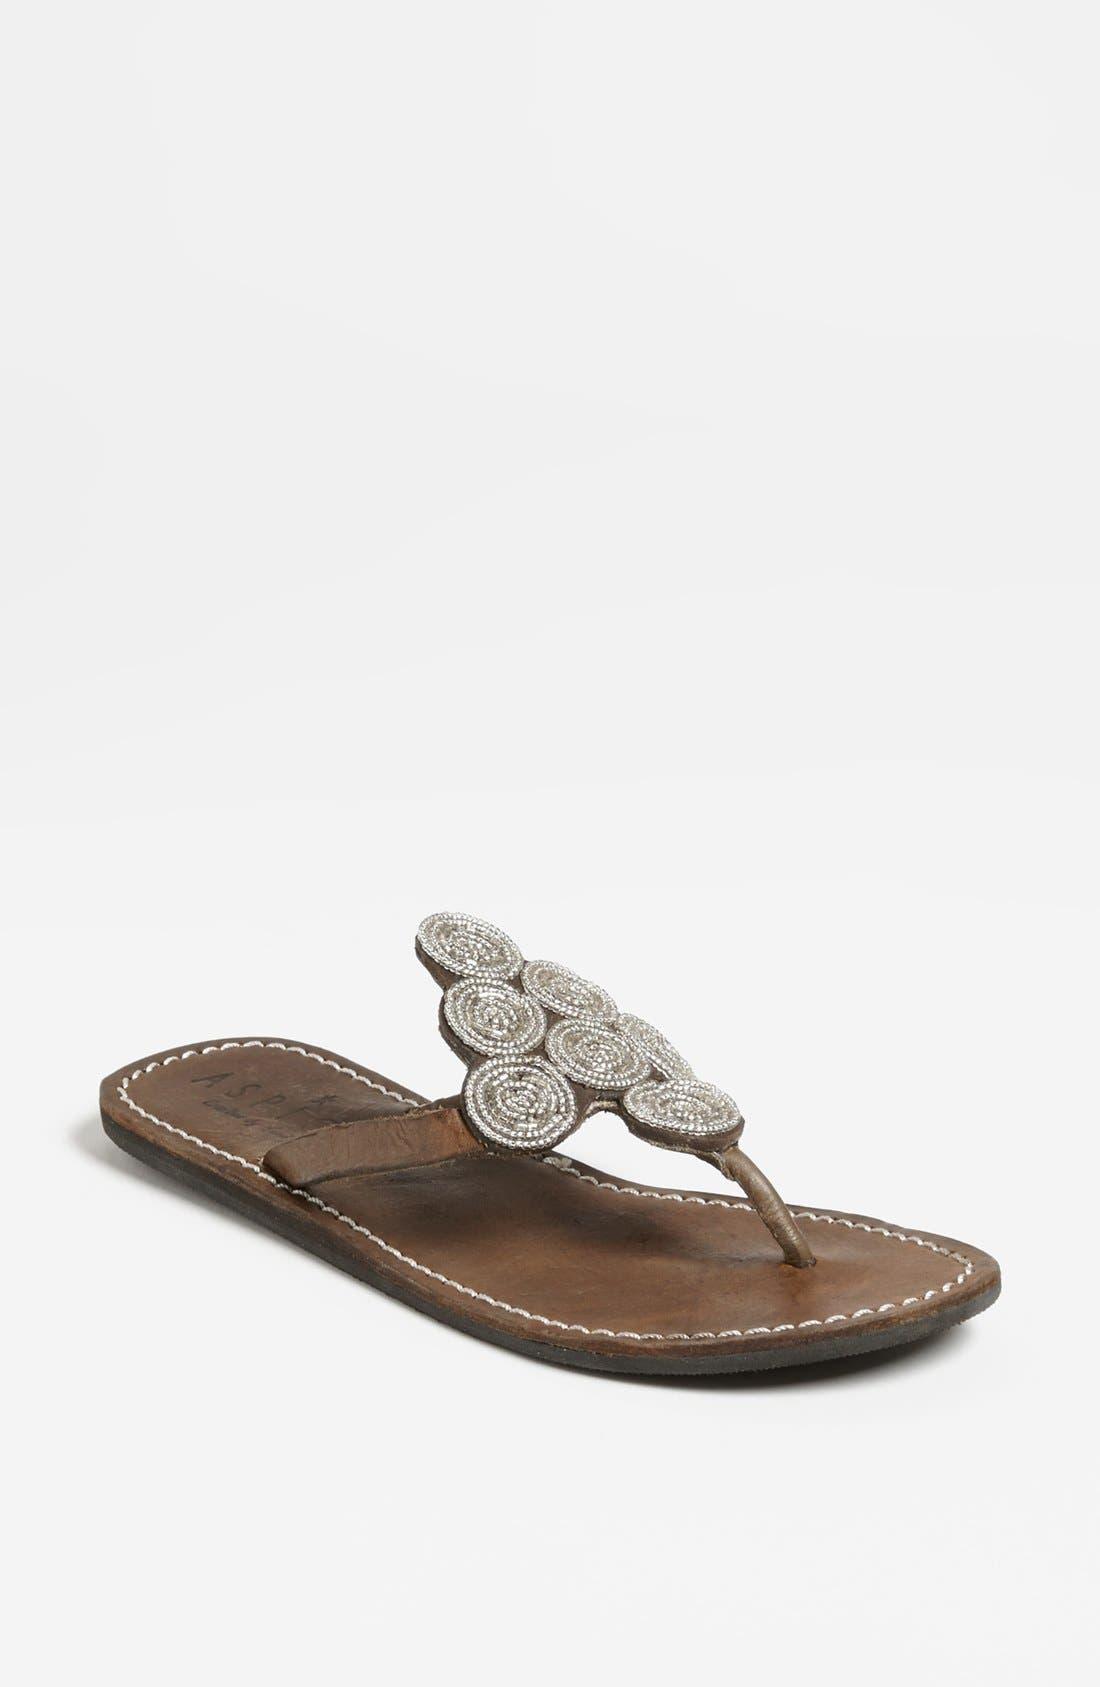 Alternate Image 1 Selected - Aspiga 'Bayo' Sandal